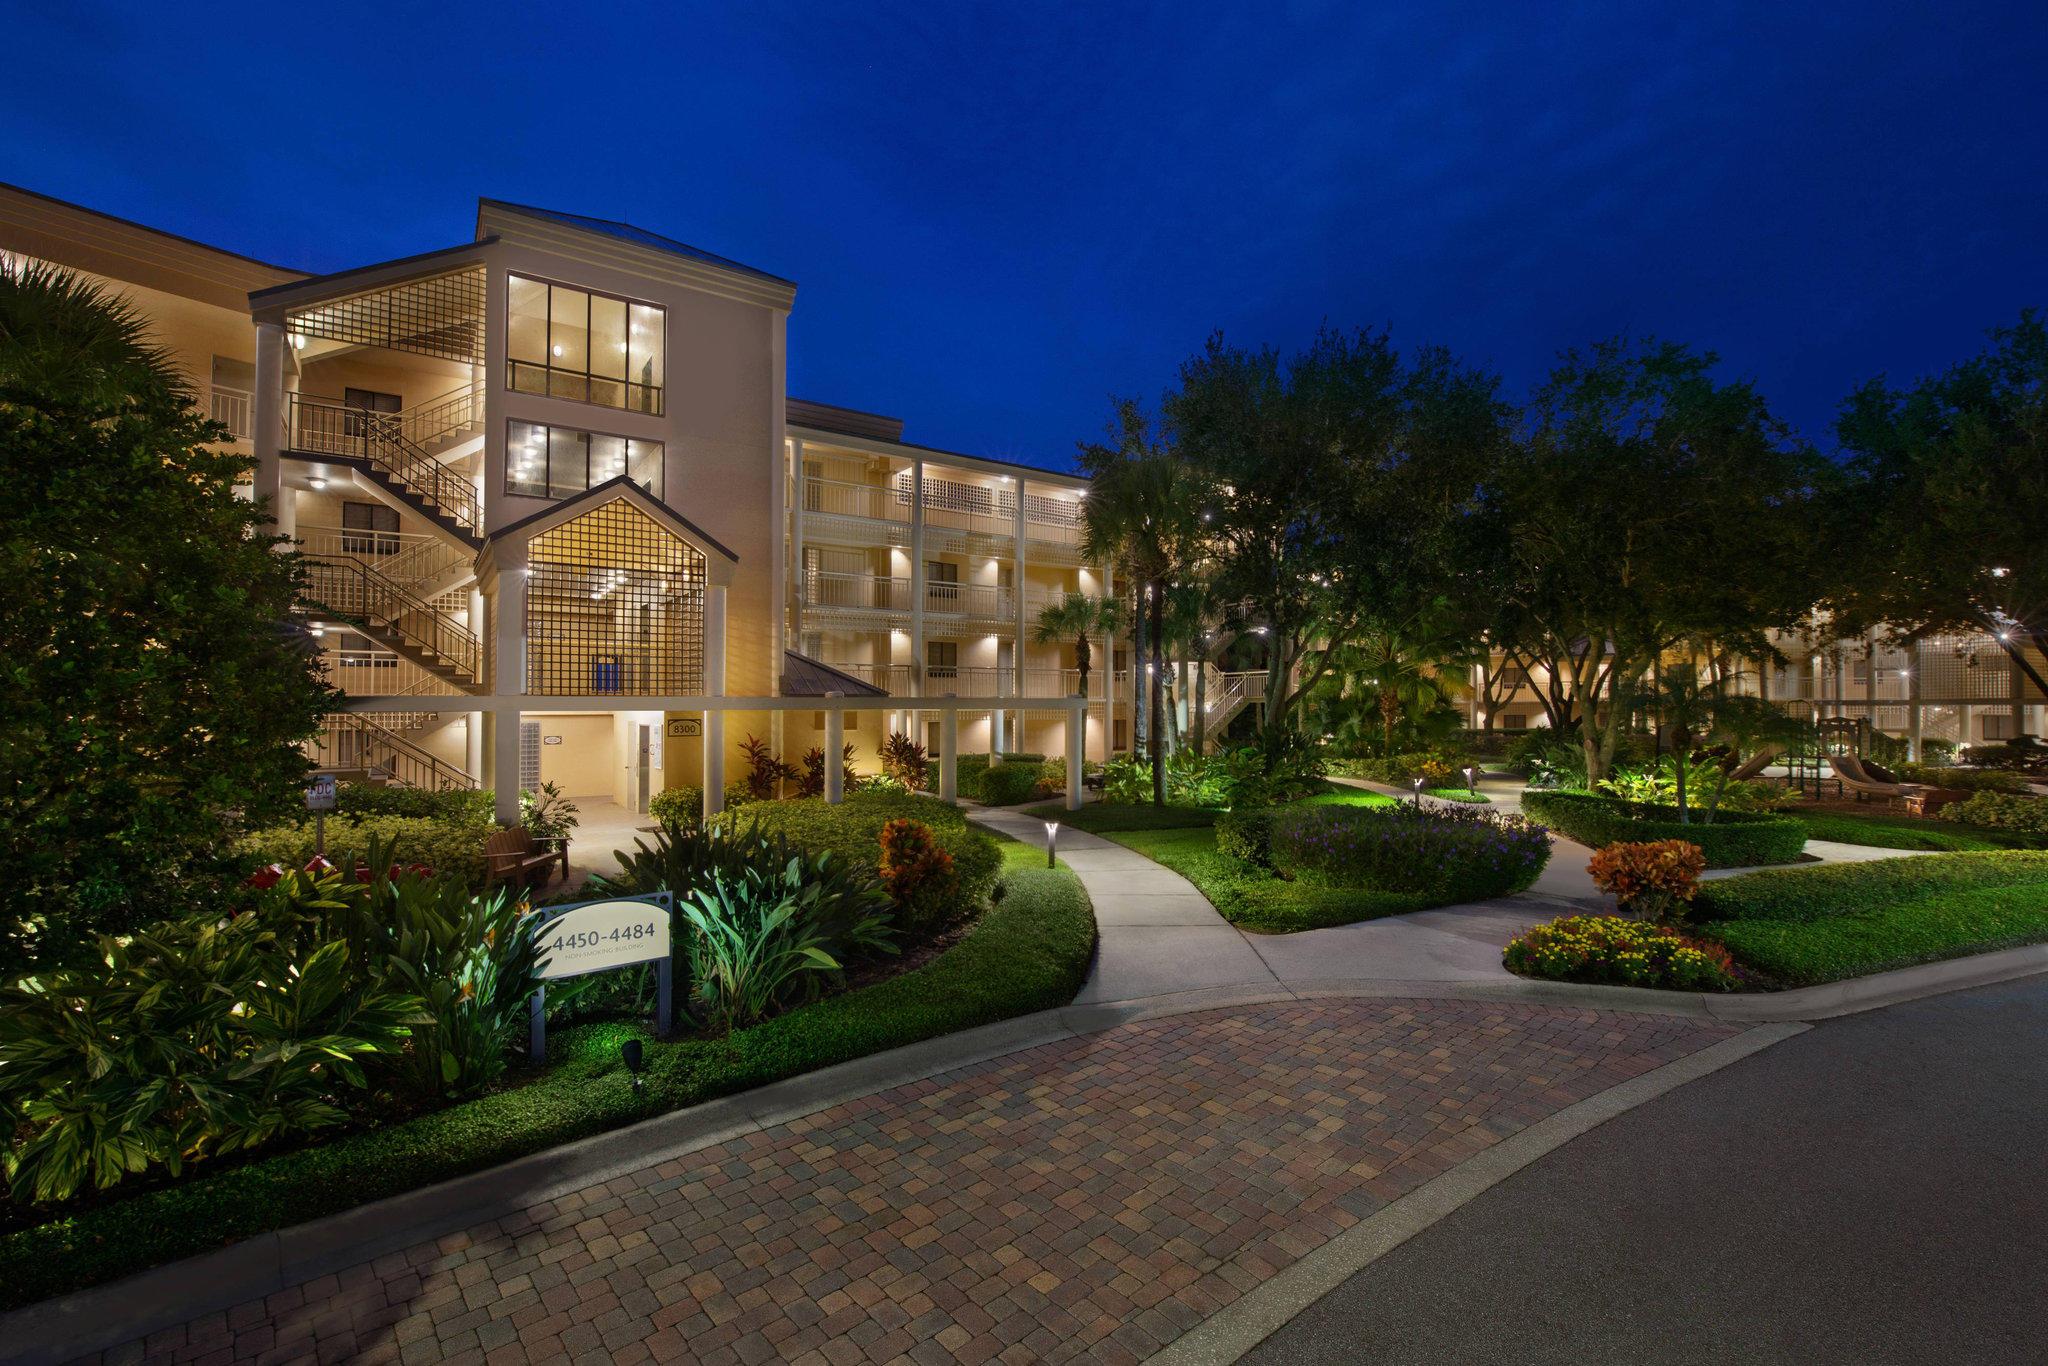 Marriott's Royal Palms